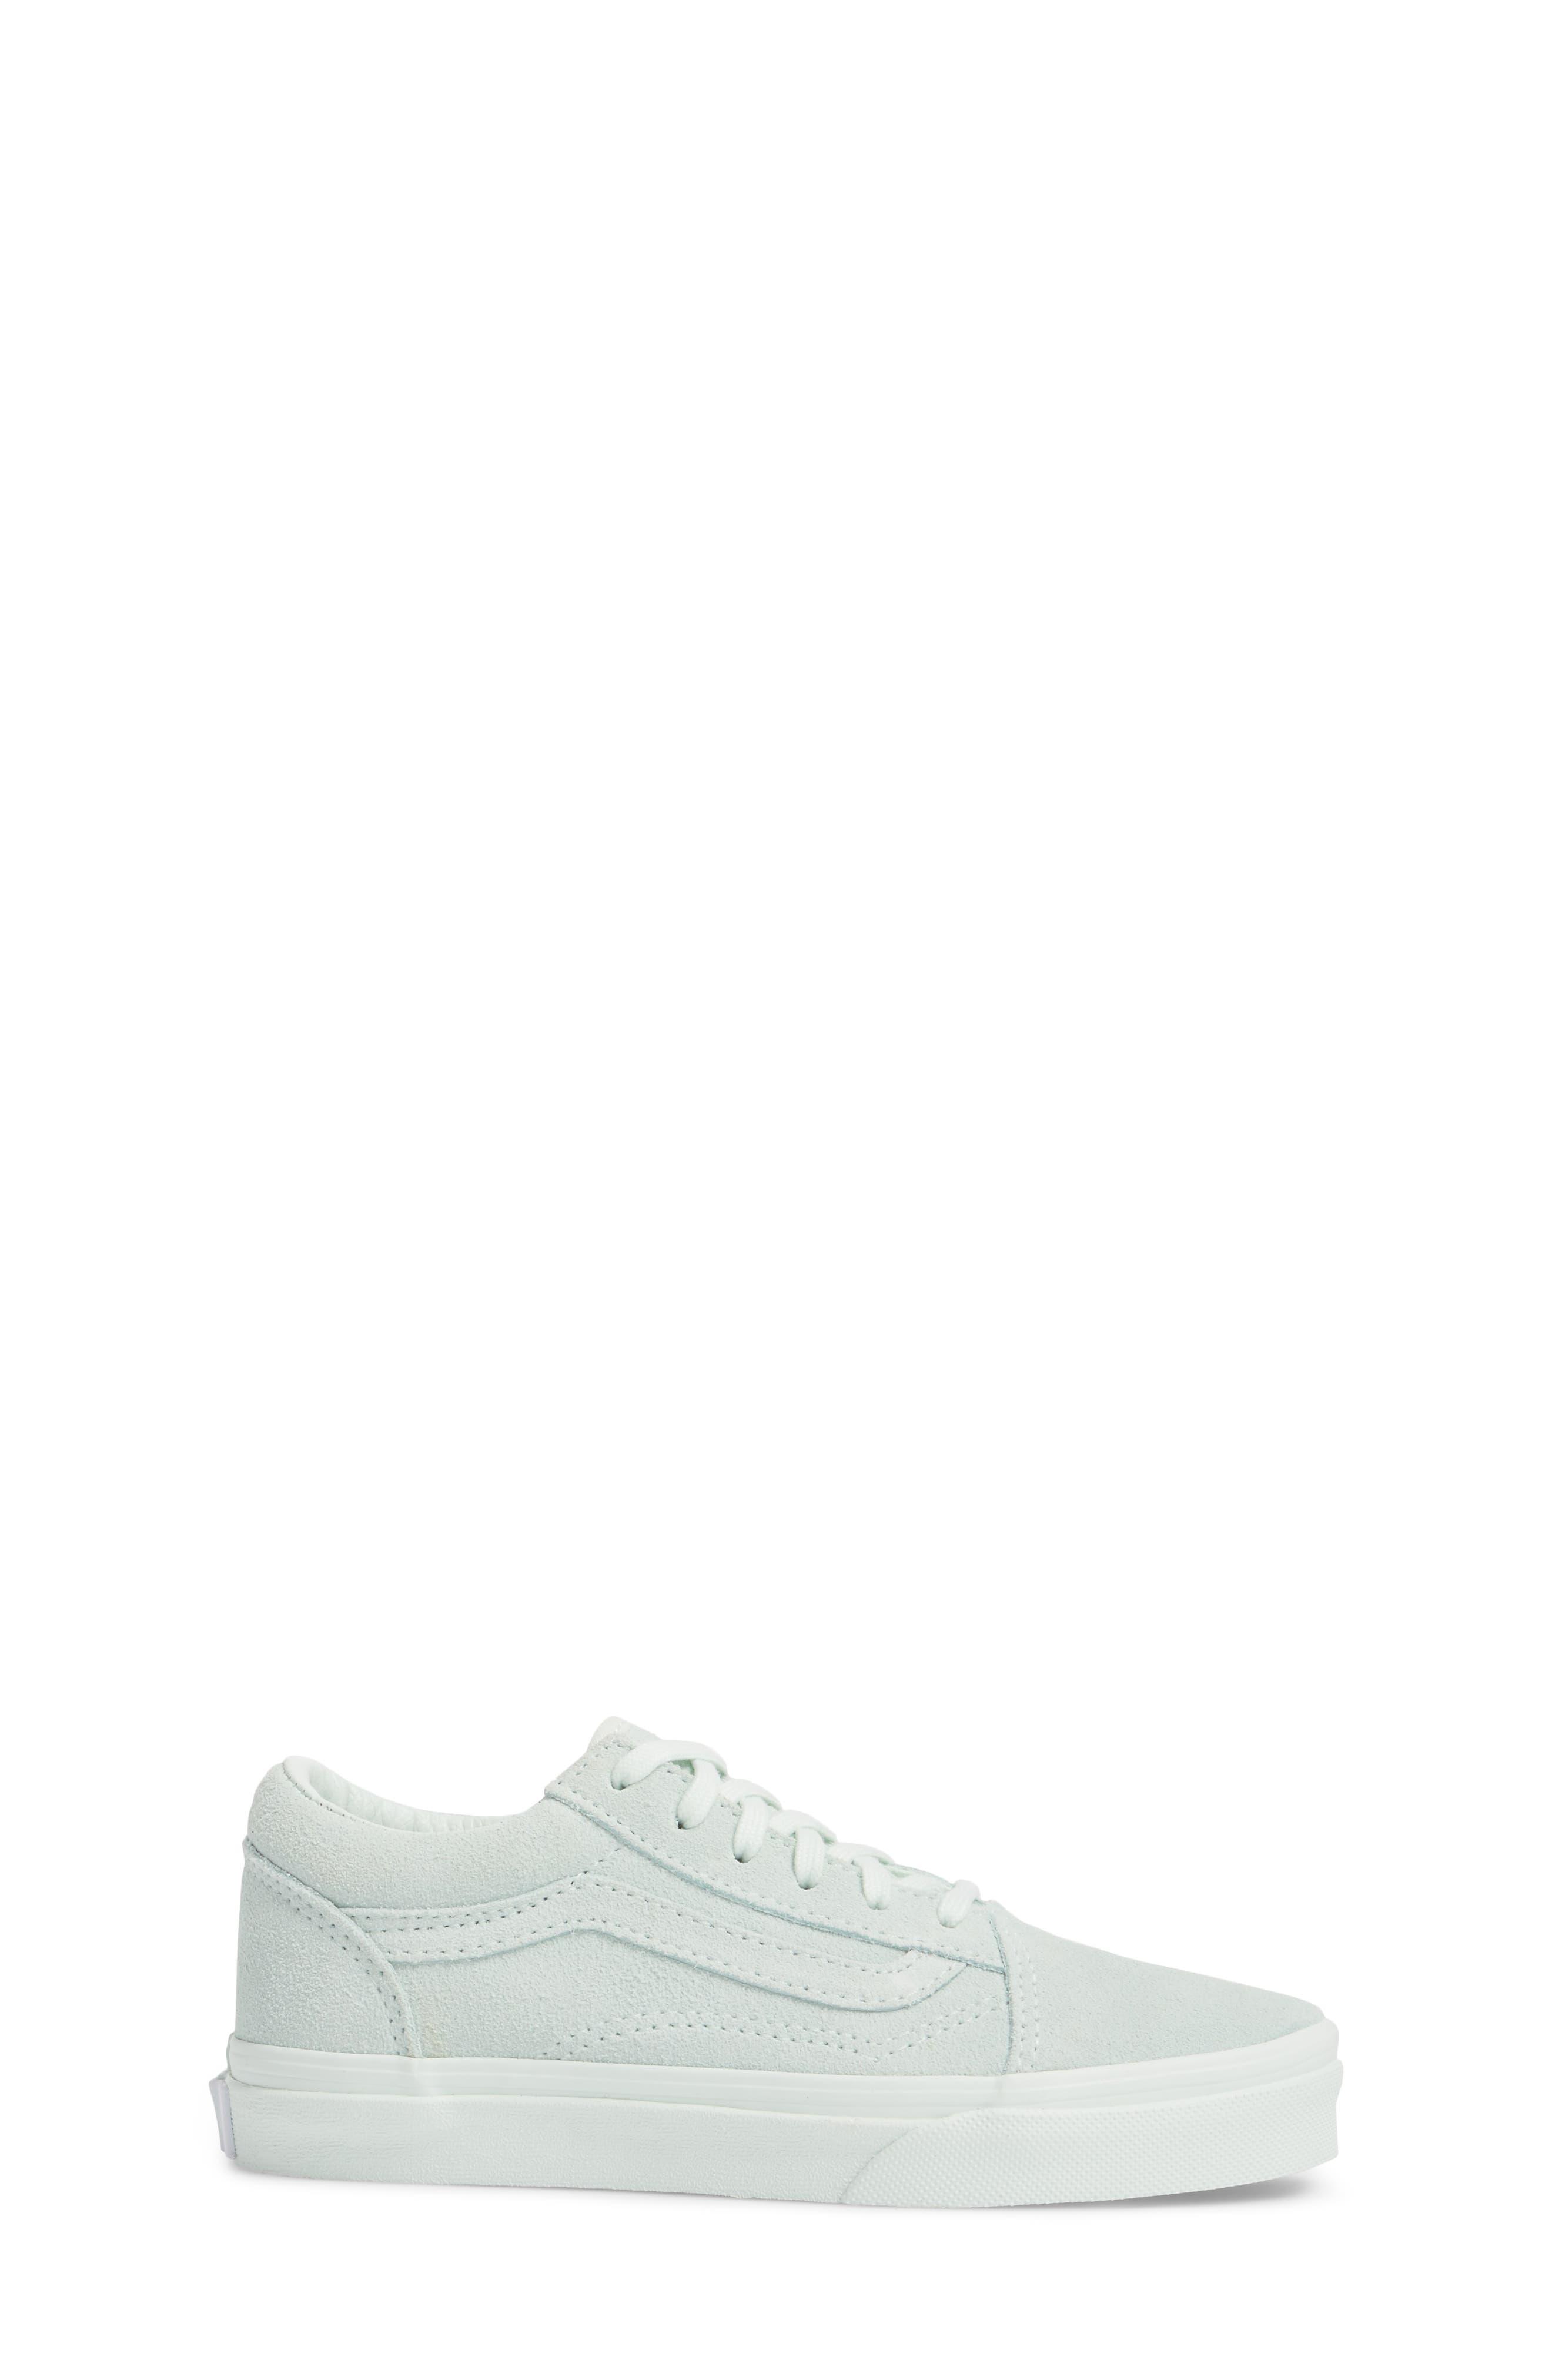 Old Skool Low Top Sneaker,                             Alternate thumbnail 3, color,                             300